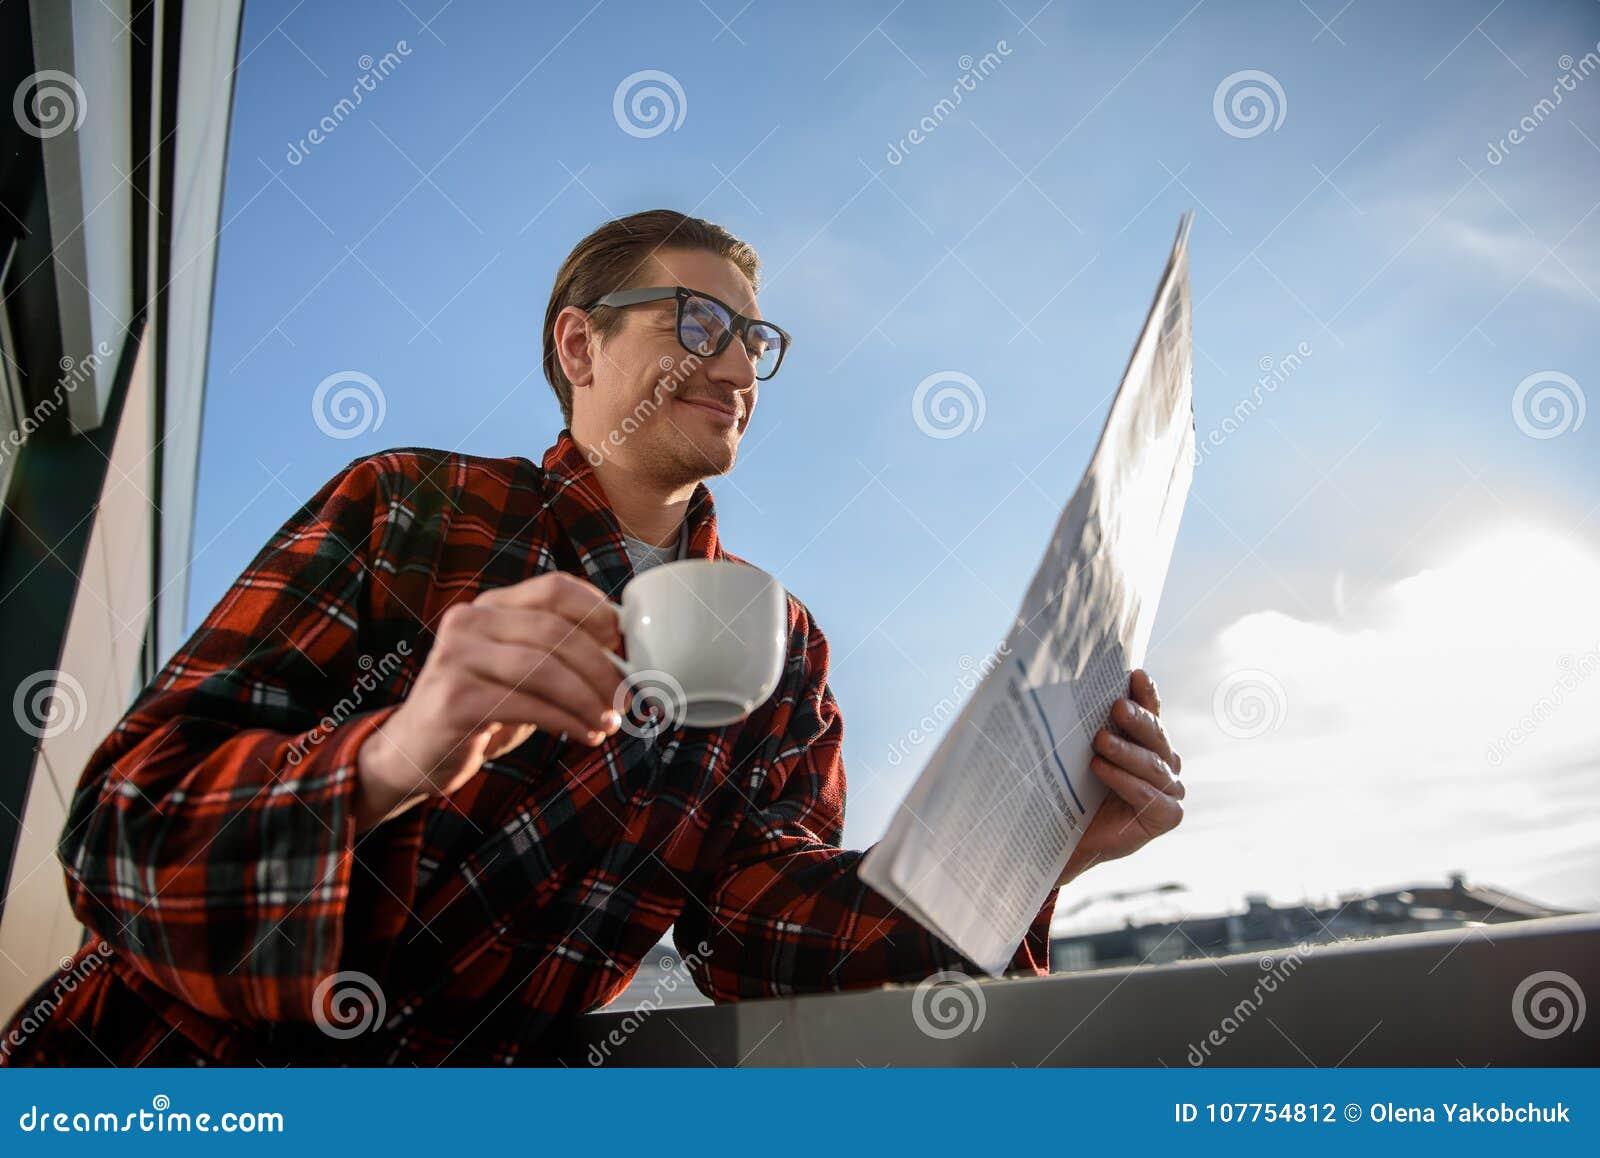 Pleased man enjoying coffee and journal on terrace